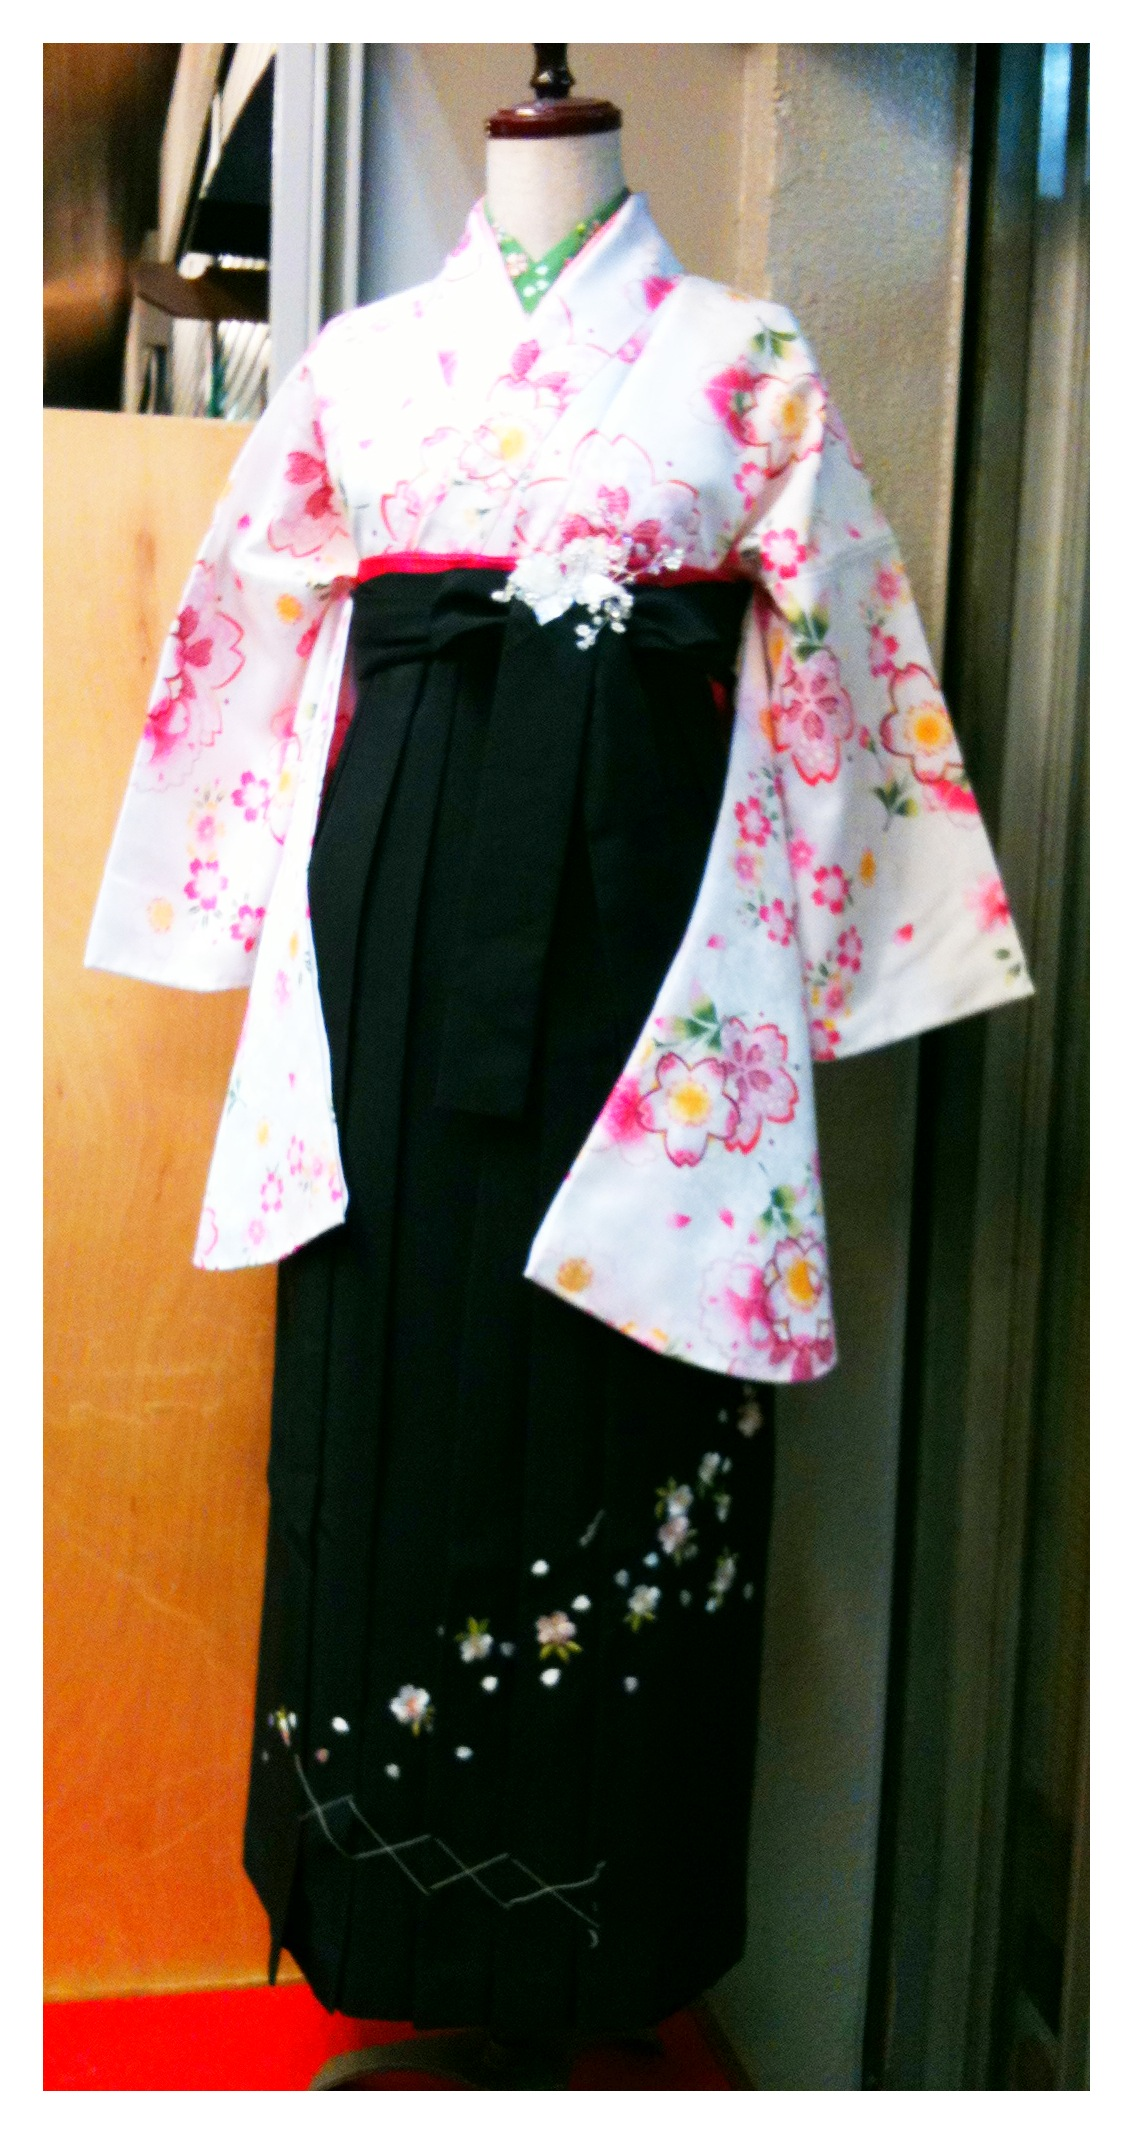 IMG_0062 こちらの袴・着物ですと 袴 38,000円の商品が ⇒10,000円 ...